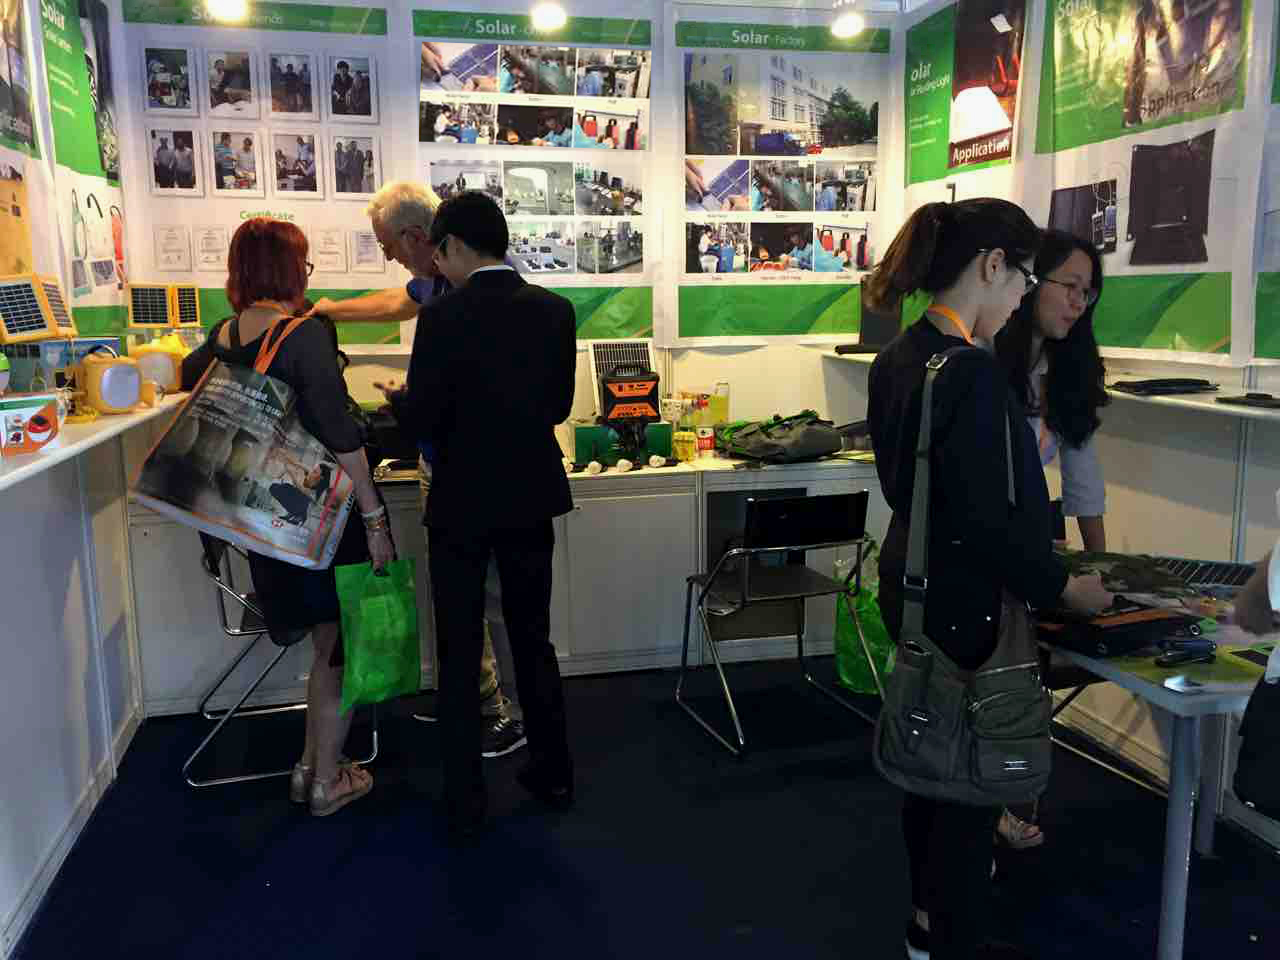 2017 Hktdc Hong Kong International Lighting Fair Spring EditionHong Kong International Lighting Fair 2015 Spring Edition  . Hktdc Hong Kong International Lighting Fair Spring Edition 2015. Home Design Ideas